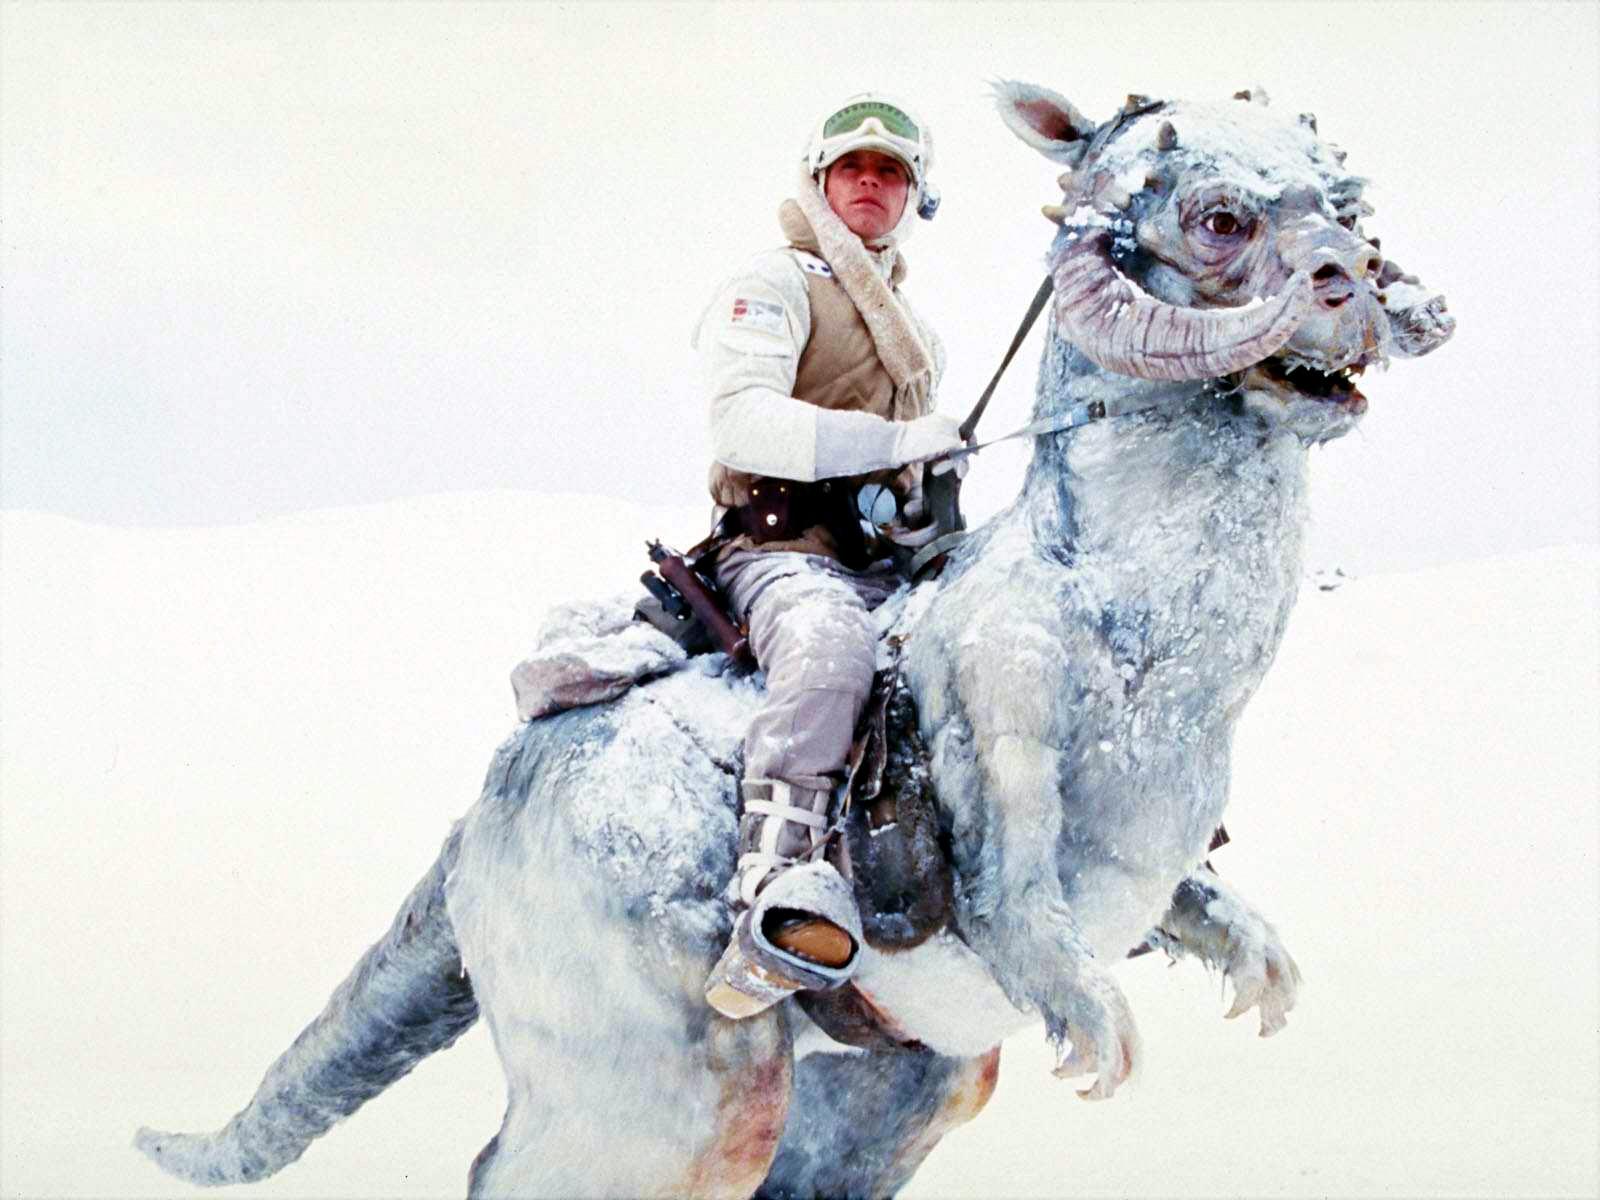 Me heading to work.